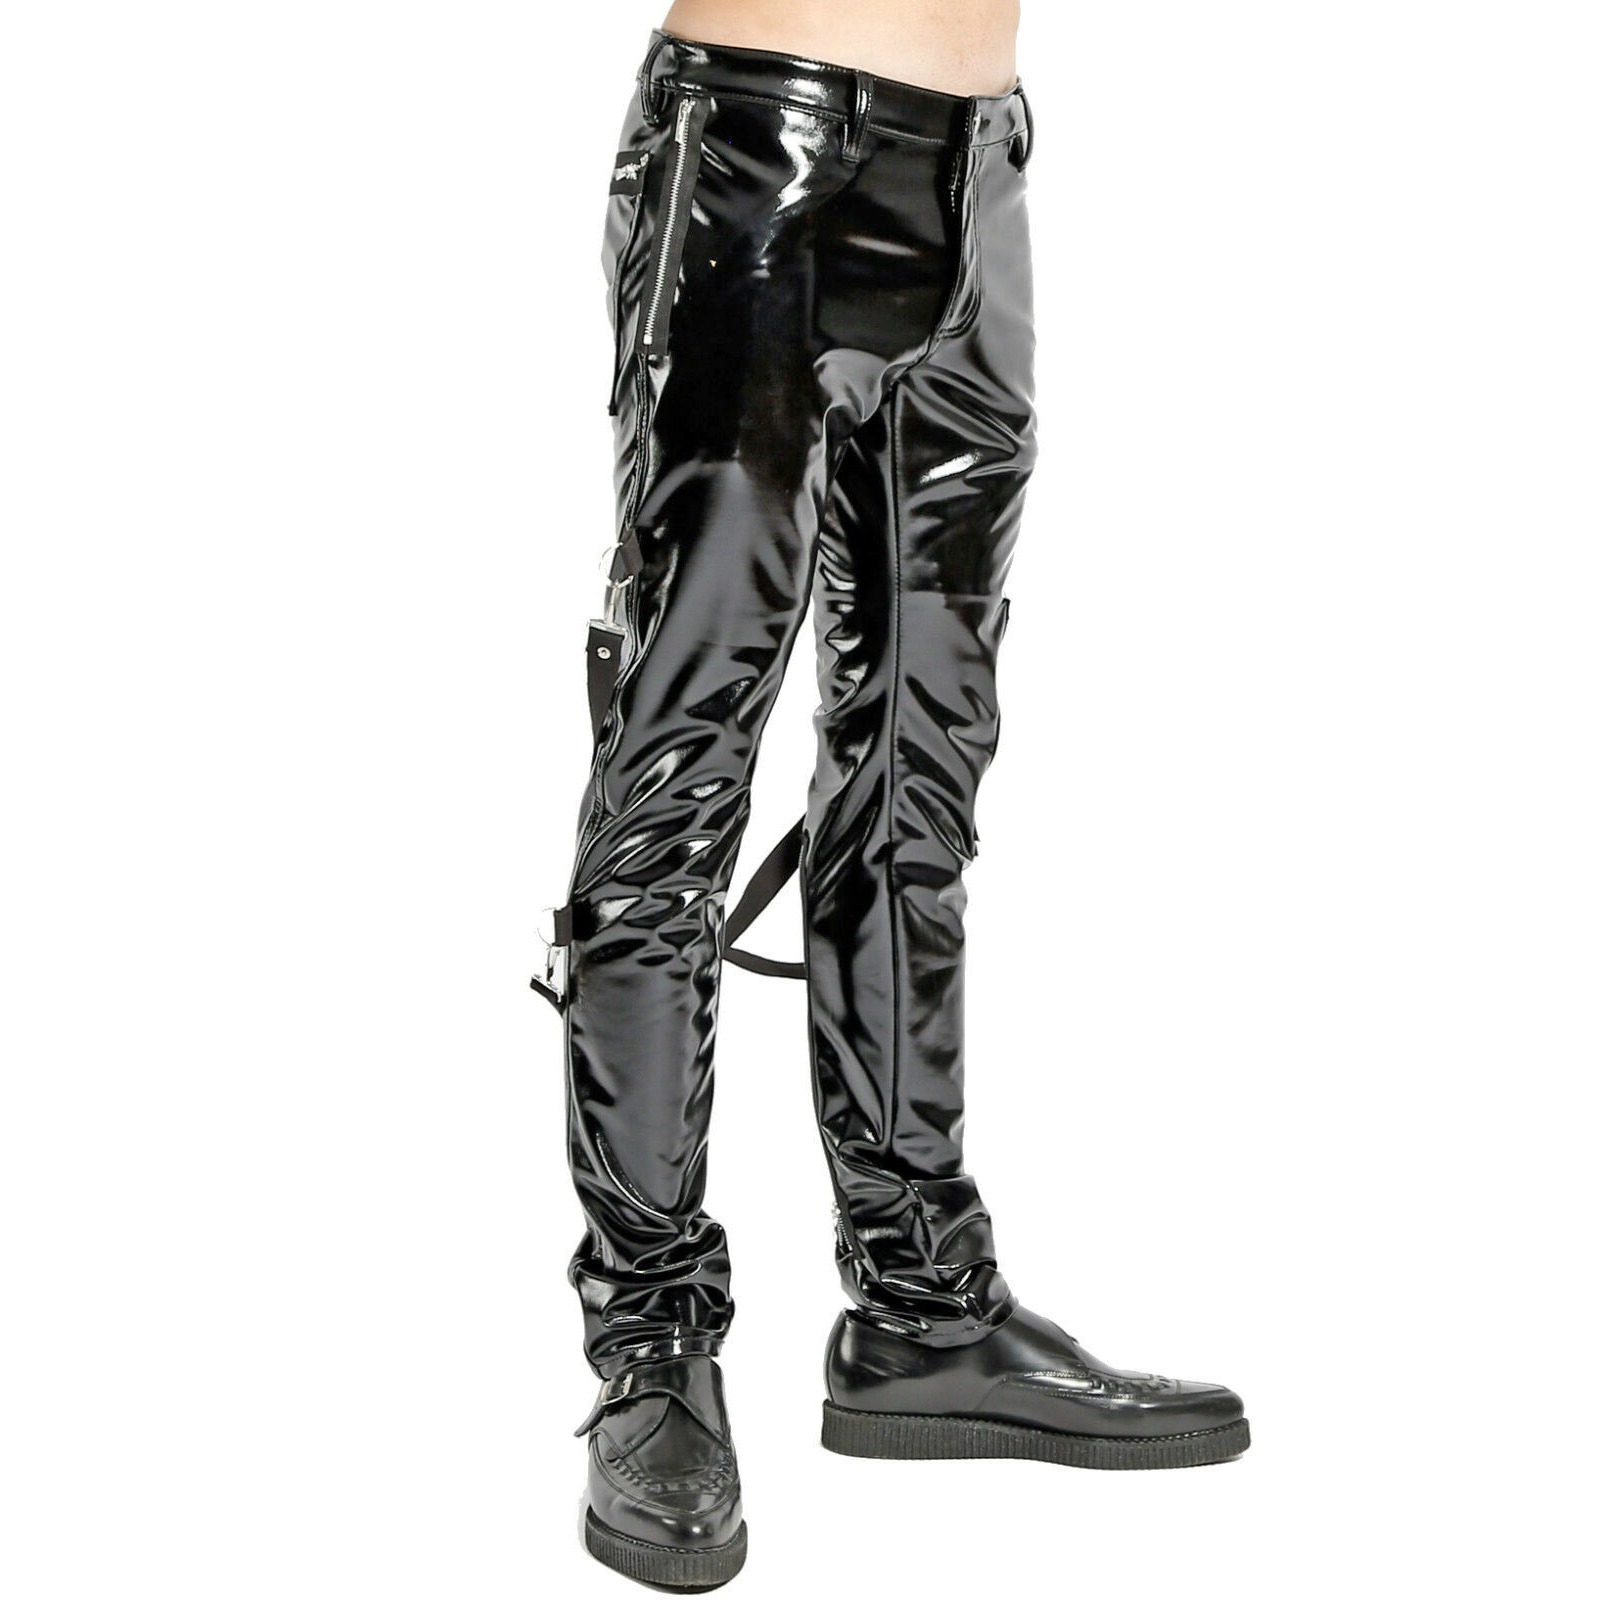 SKINNY JEANS BLACK GOTHIC SUPREME CHAOS VINYL PUNK REBEL PANTS WITH STRAP (1)